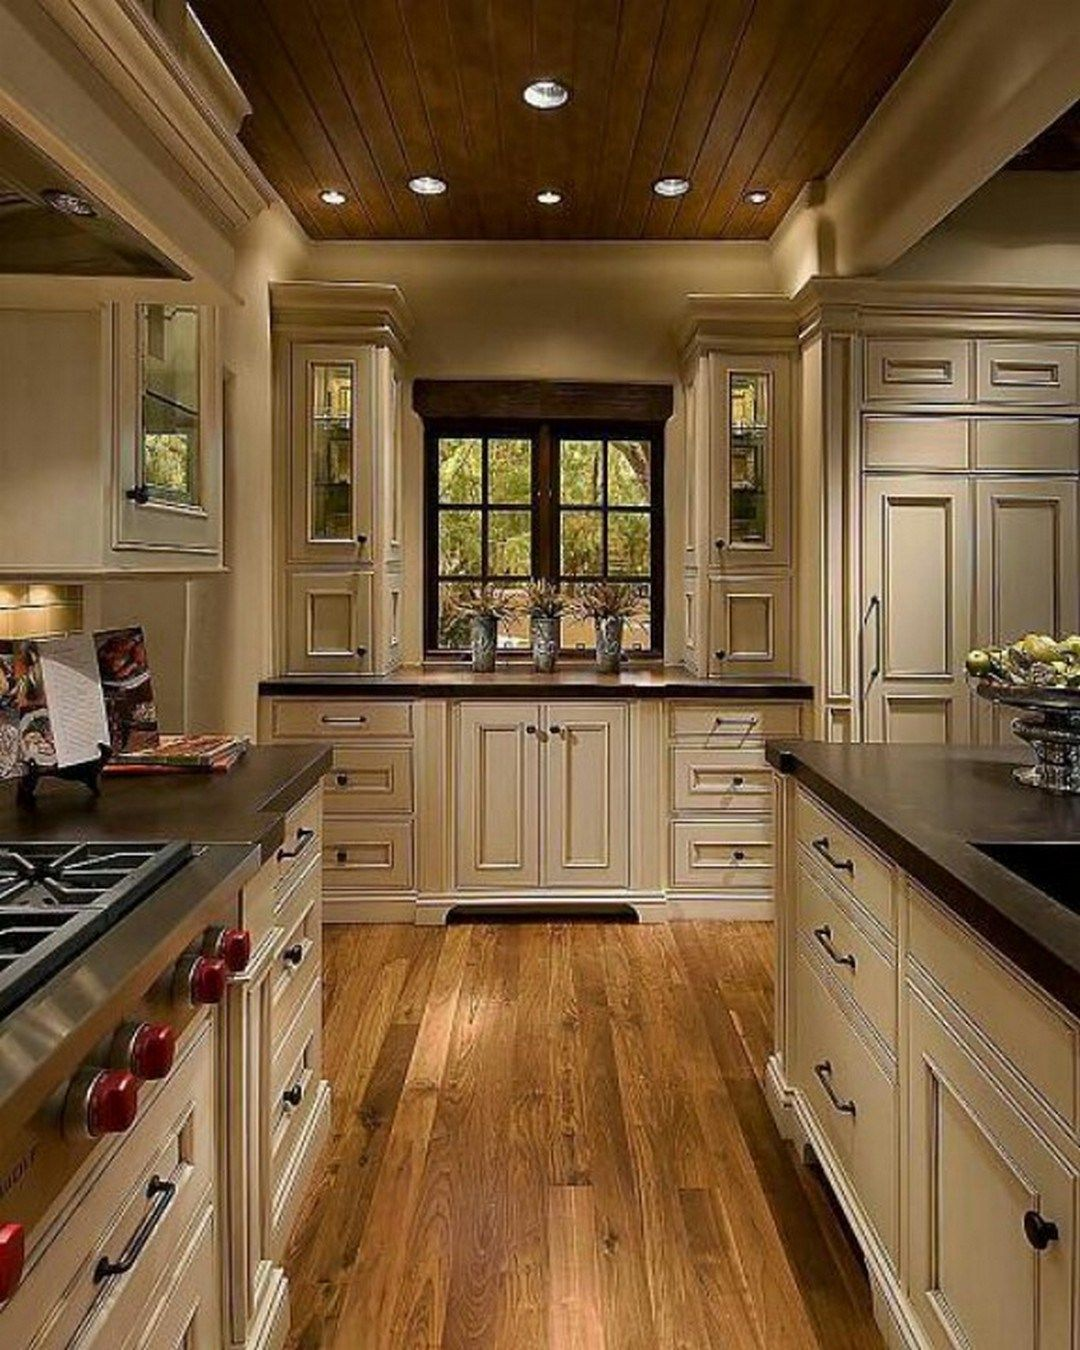 99 French Country Kitchen Modern Design Ideas (37) | Homey Ideas ...